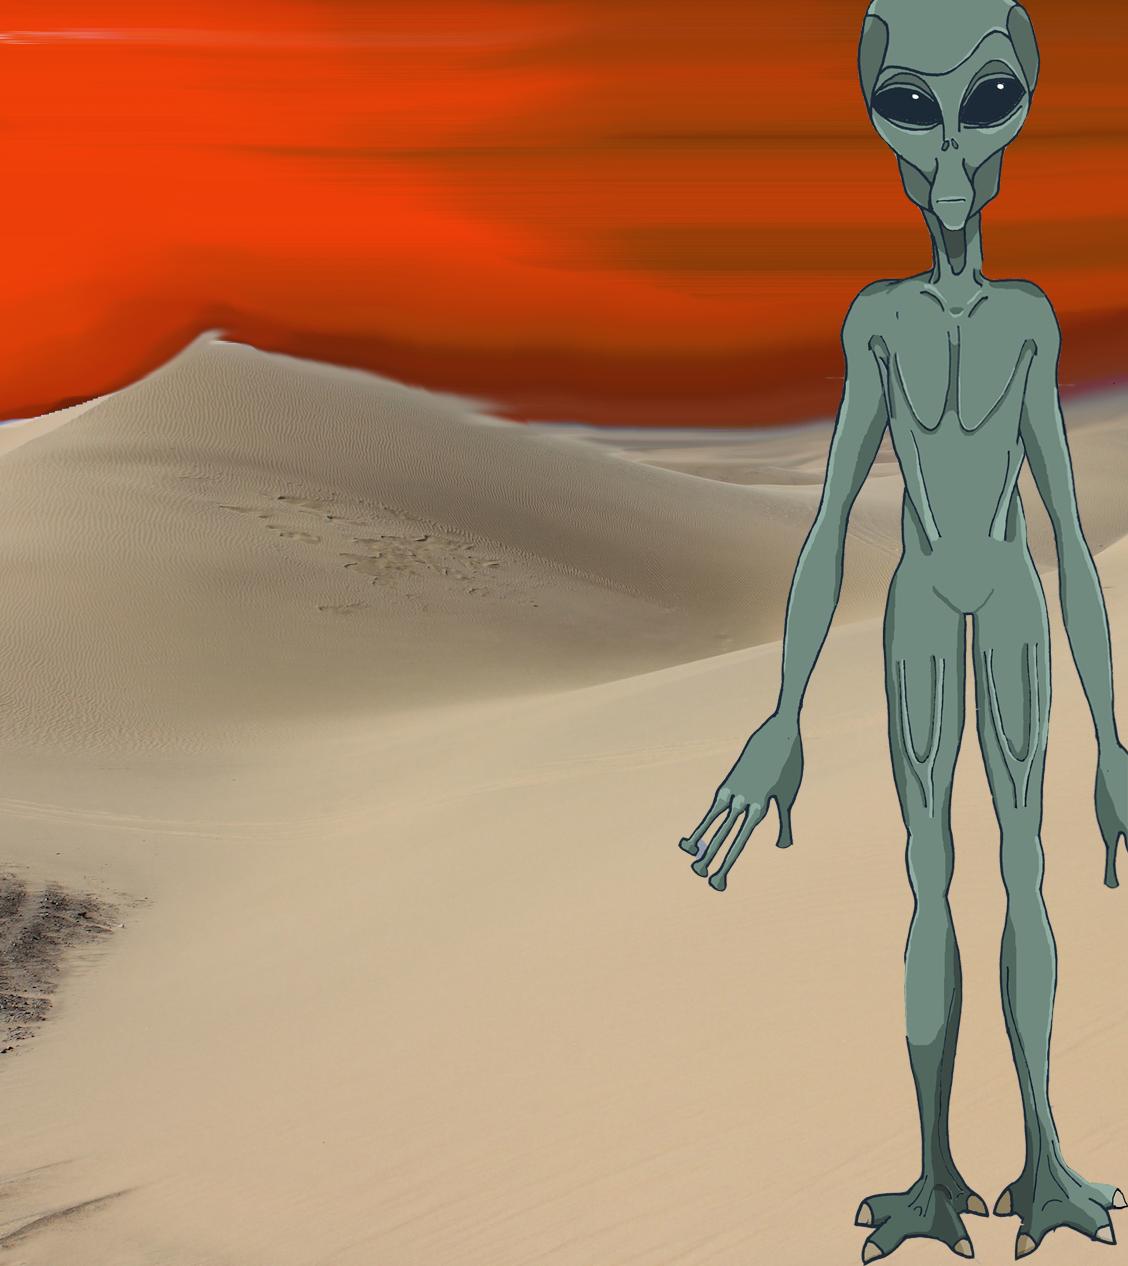 SABMG GAMBAS IN THE DESERT.jpg